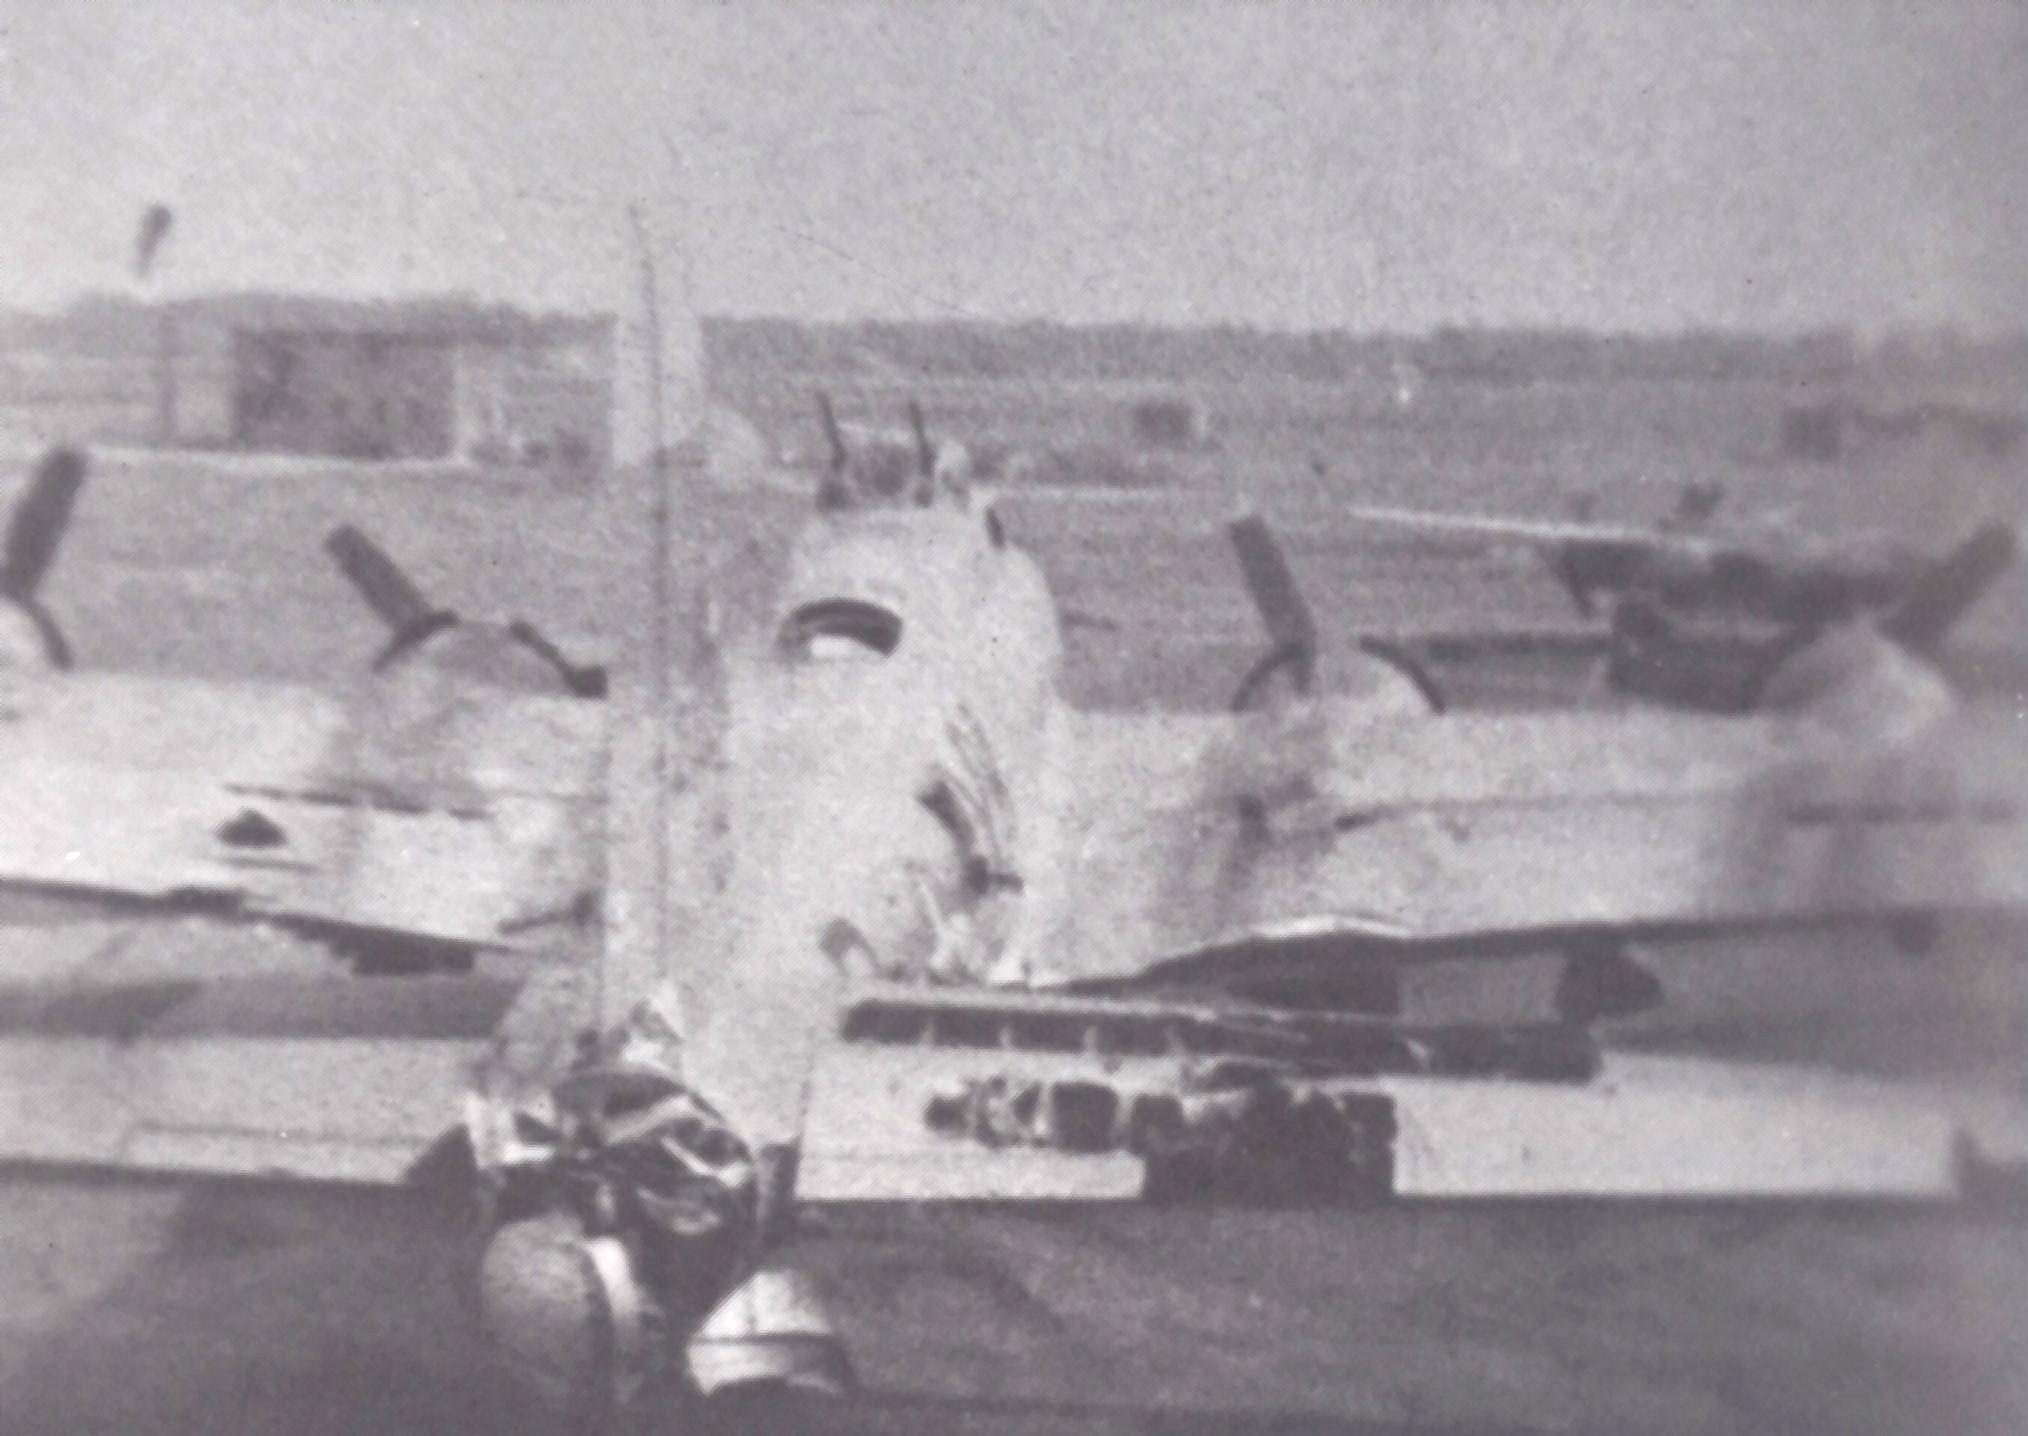 B-17 42-102609